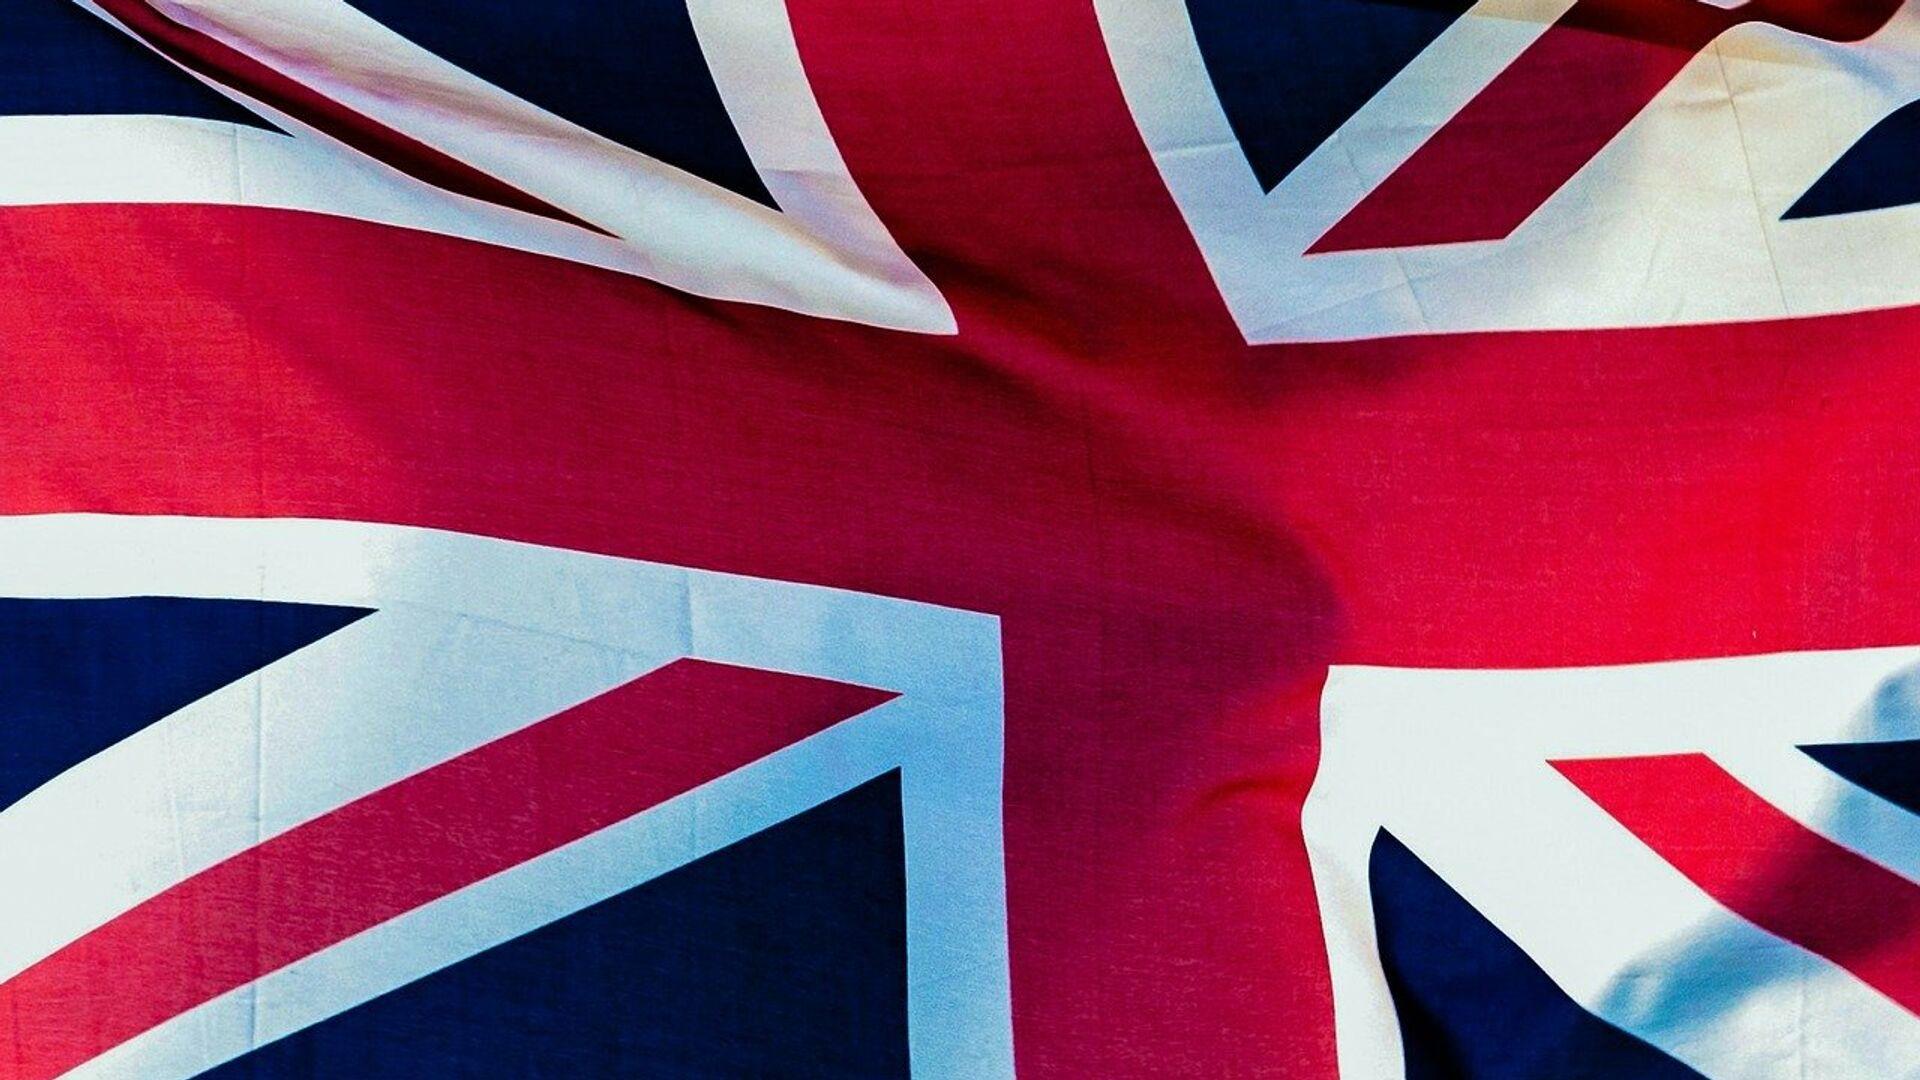 Bandera del Reino Unido - Sputnik Mundo, 1920, 02.06.2021